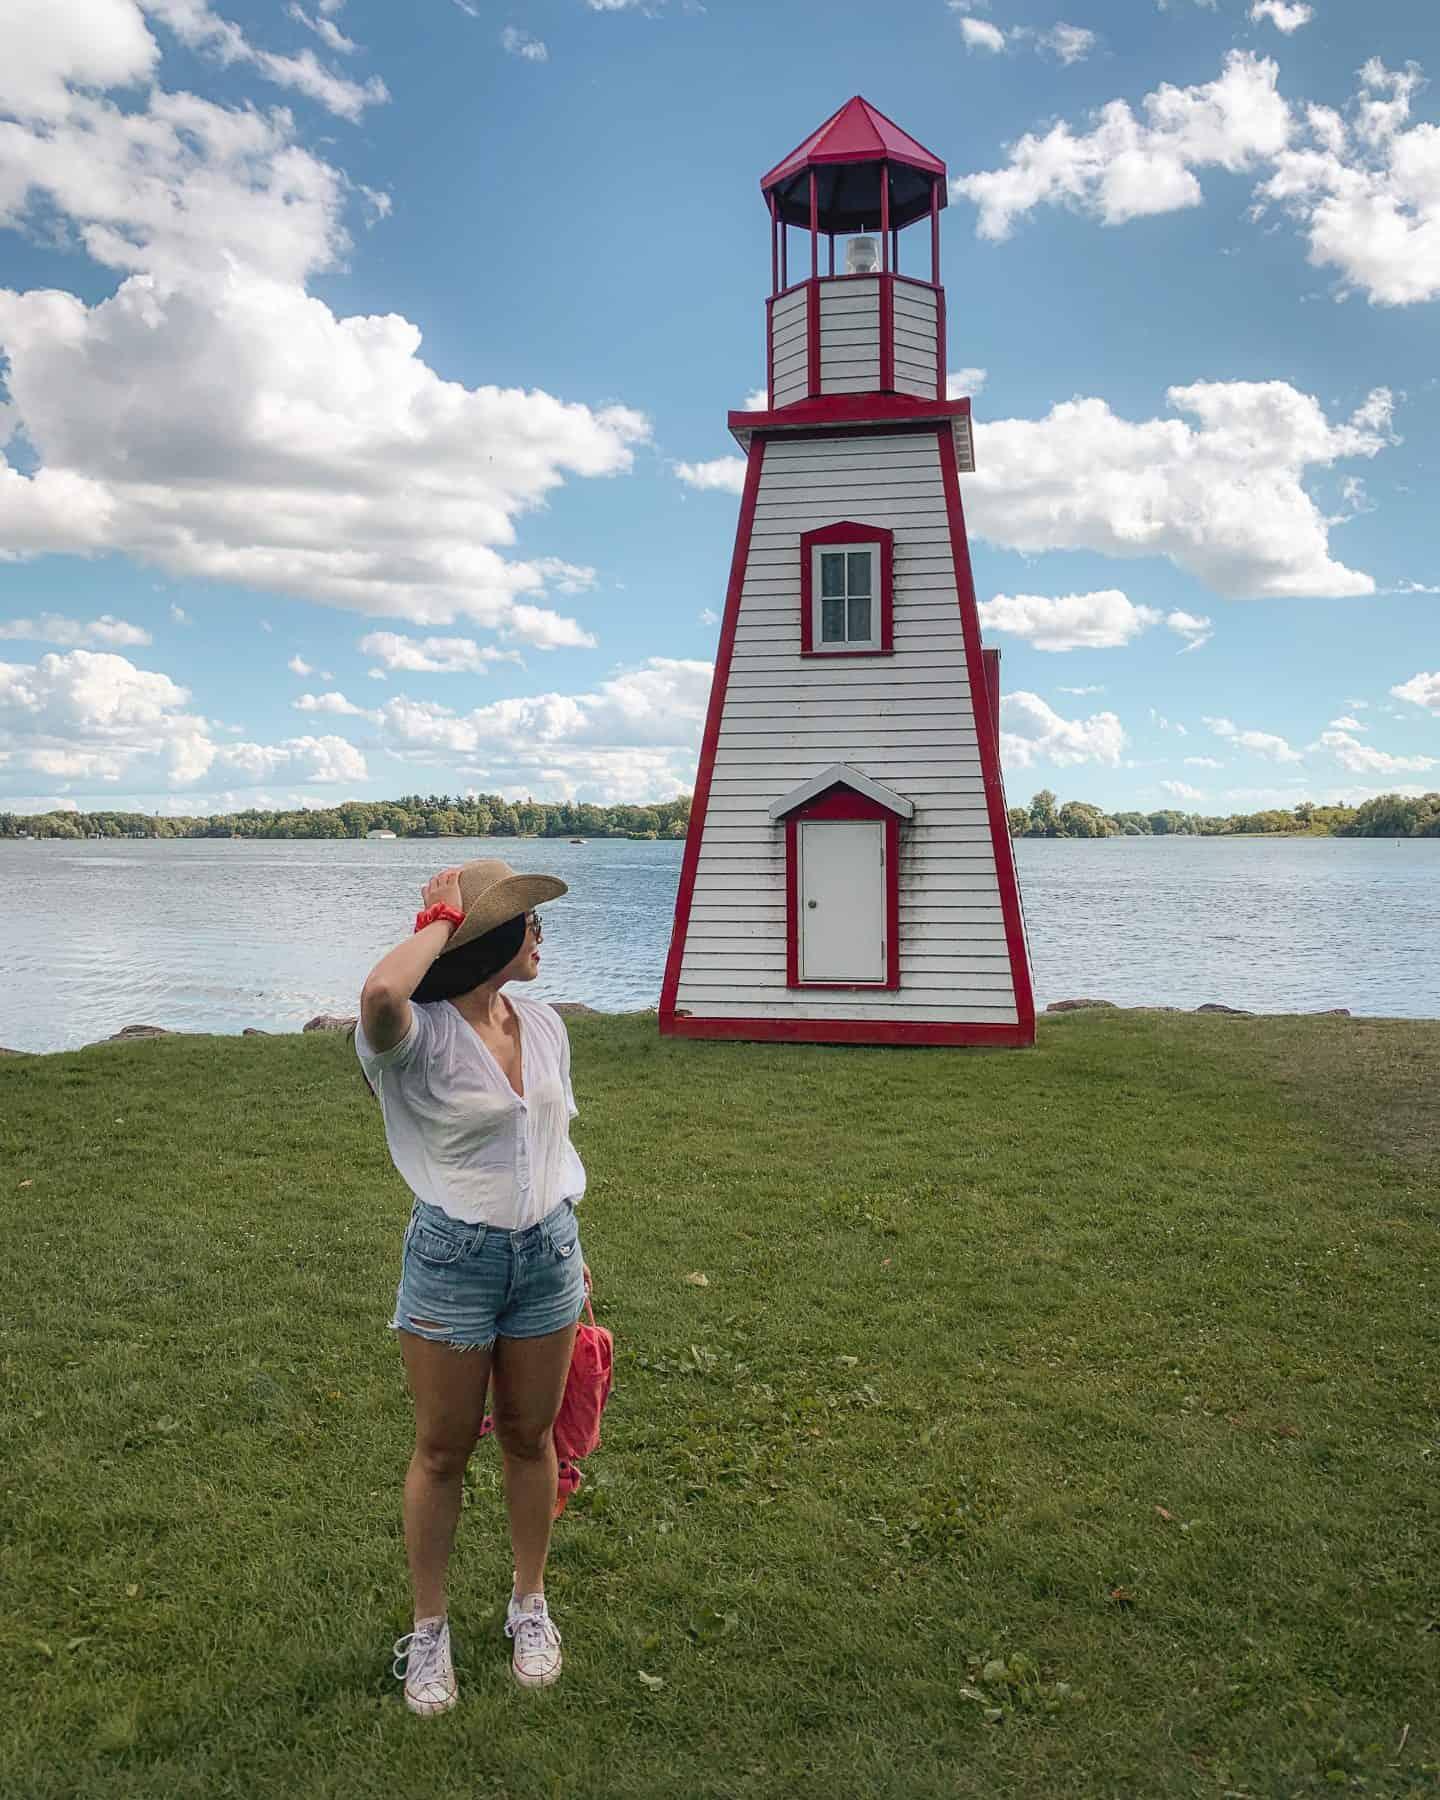 Joel Stone Heritage Park in Gananoque, Ontario